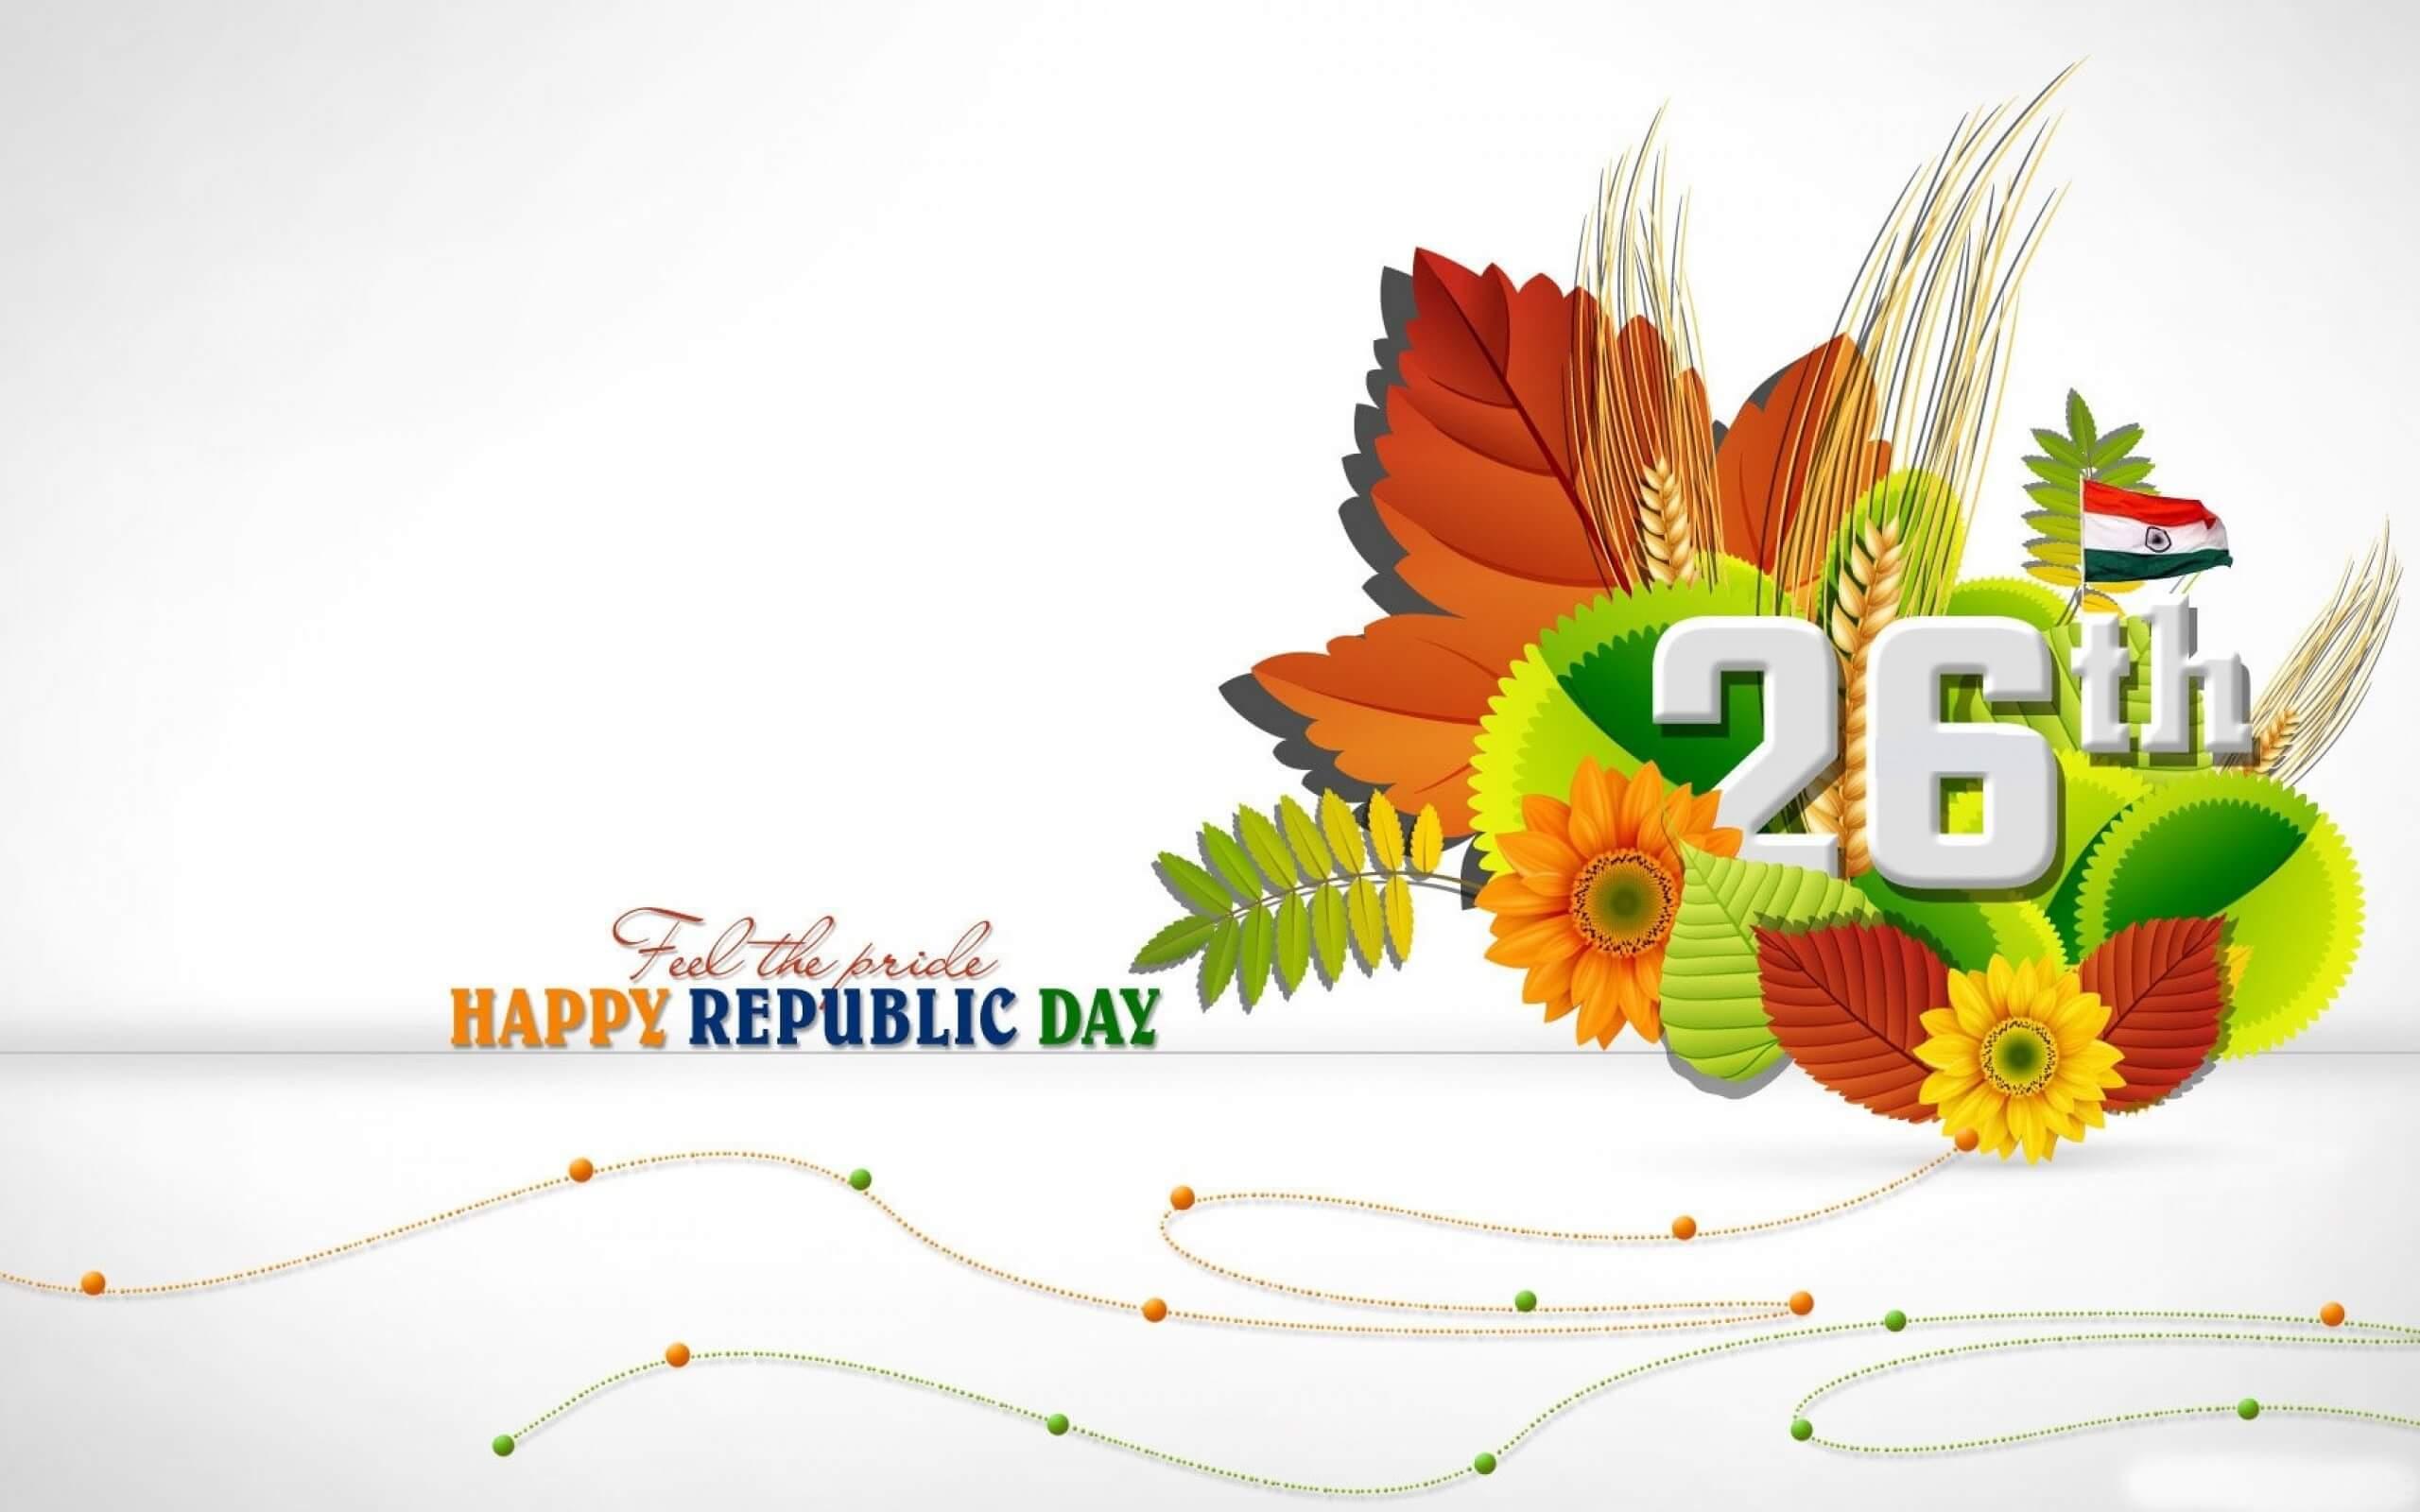 happy republic day greetings india 26th january hd desktop wallpaper